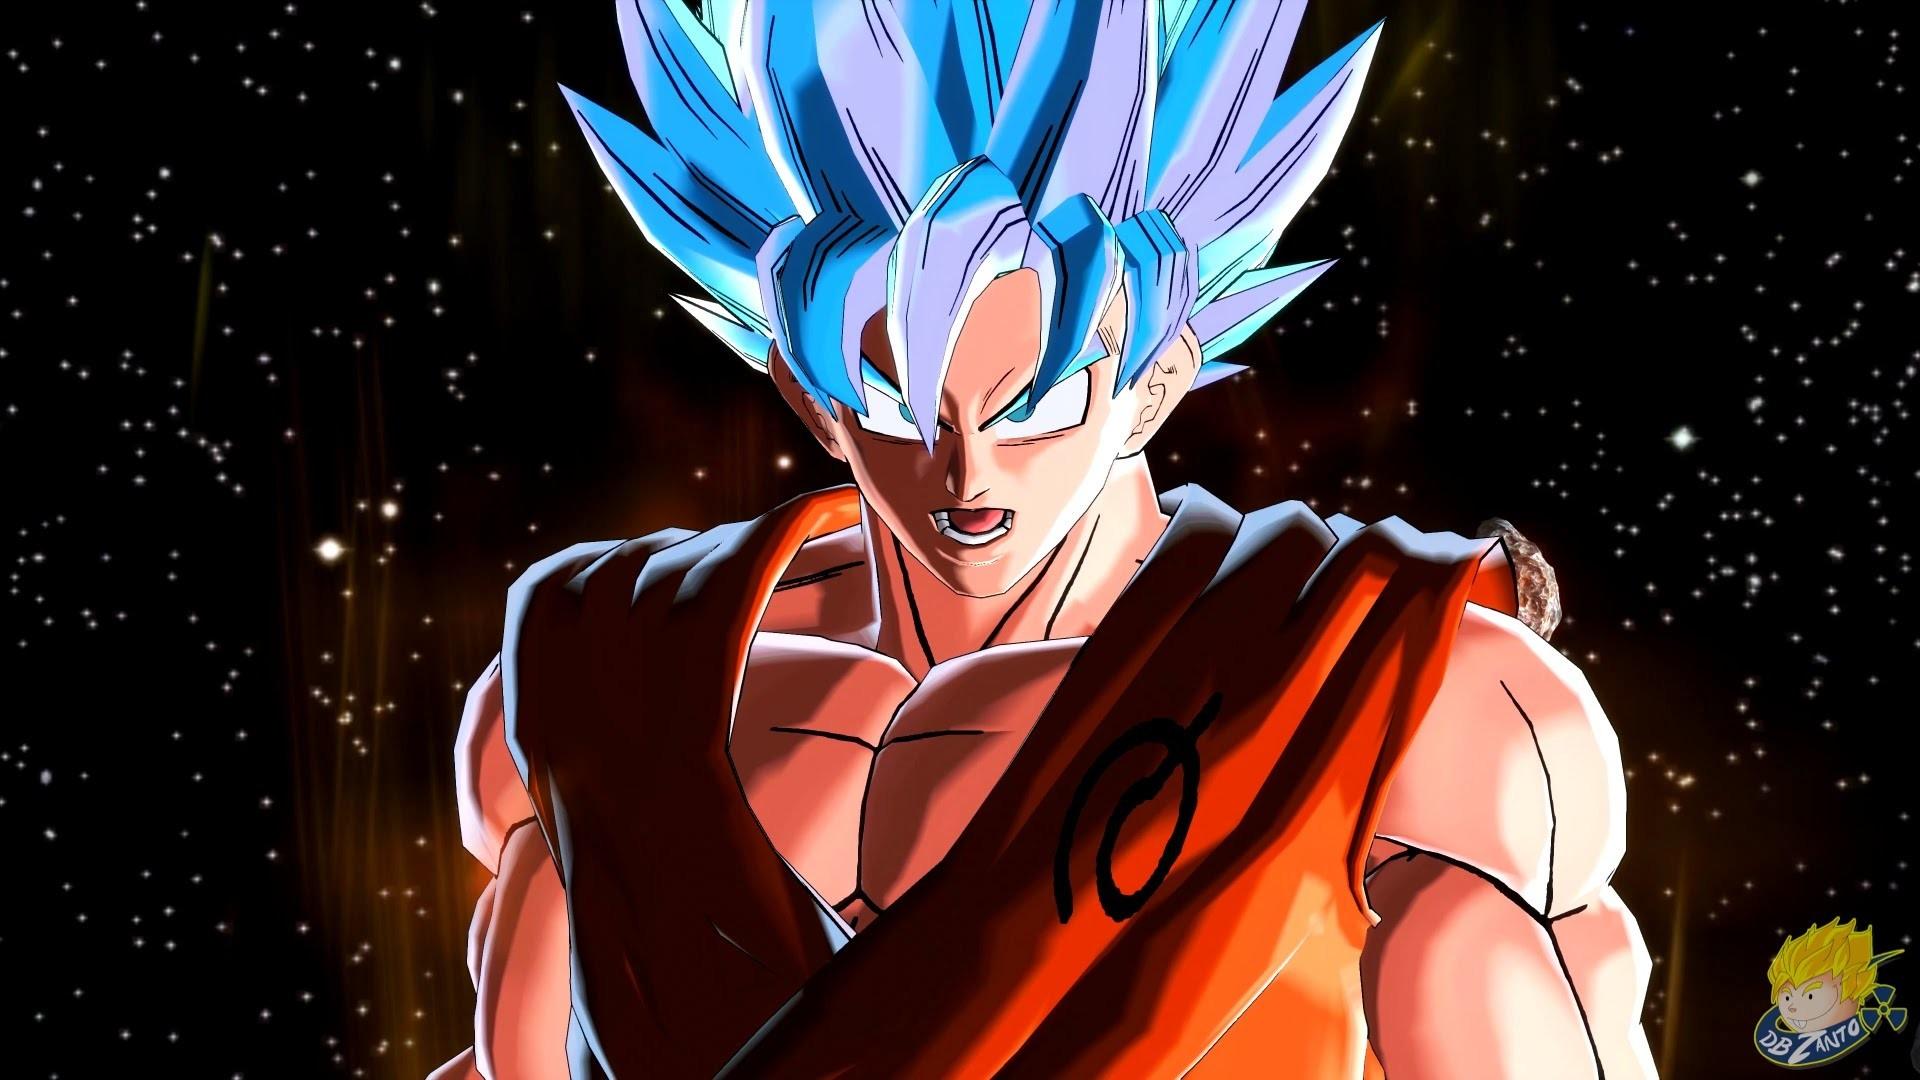 Res: 1920x1080, Dragon Ball Xenoverse (PC): SSGSS Goku Vs Golden Frieza Gameplay [MOD]  【60FPS 1080P】 - YouTube